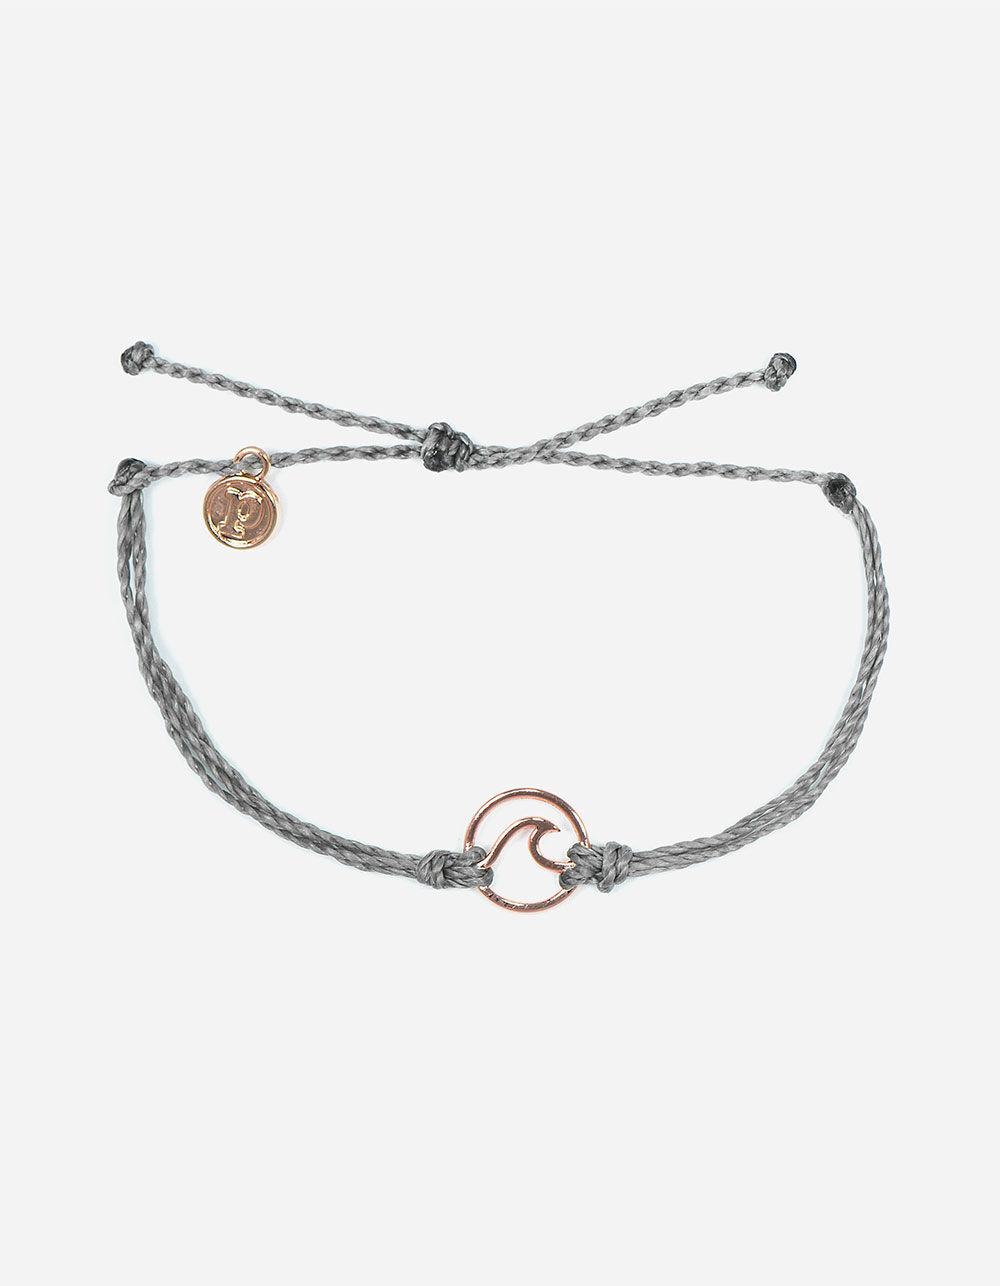 PURA VIDA Wave Gray & Rose Gold Bracelet